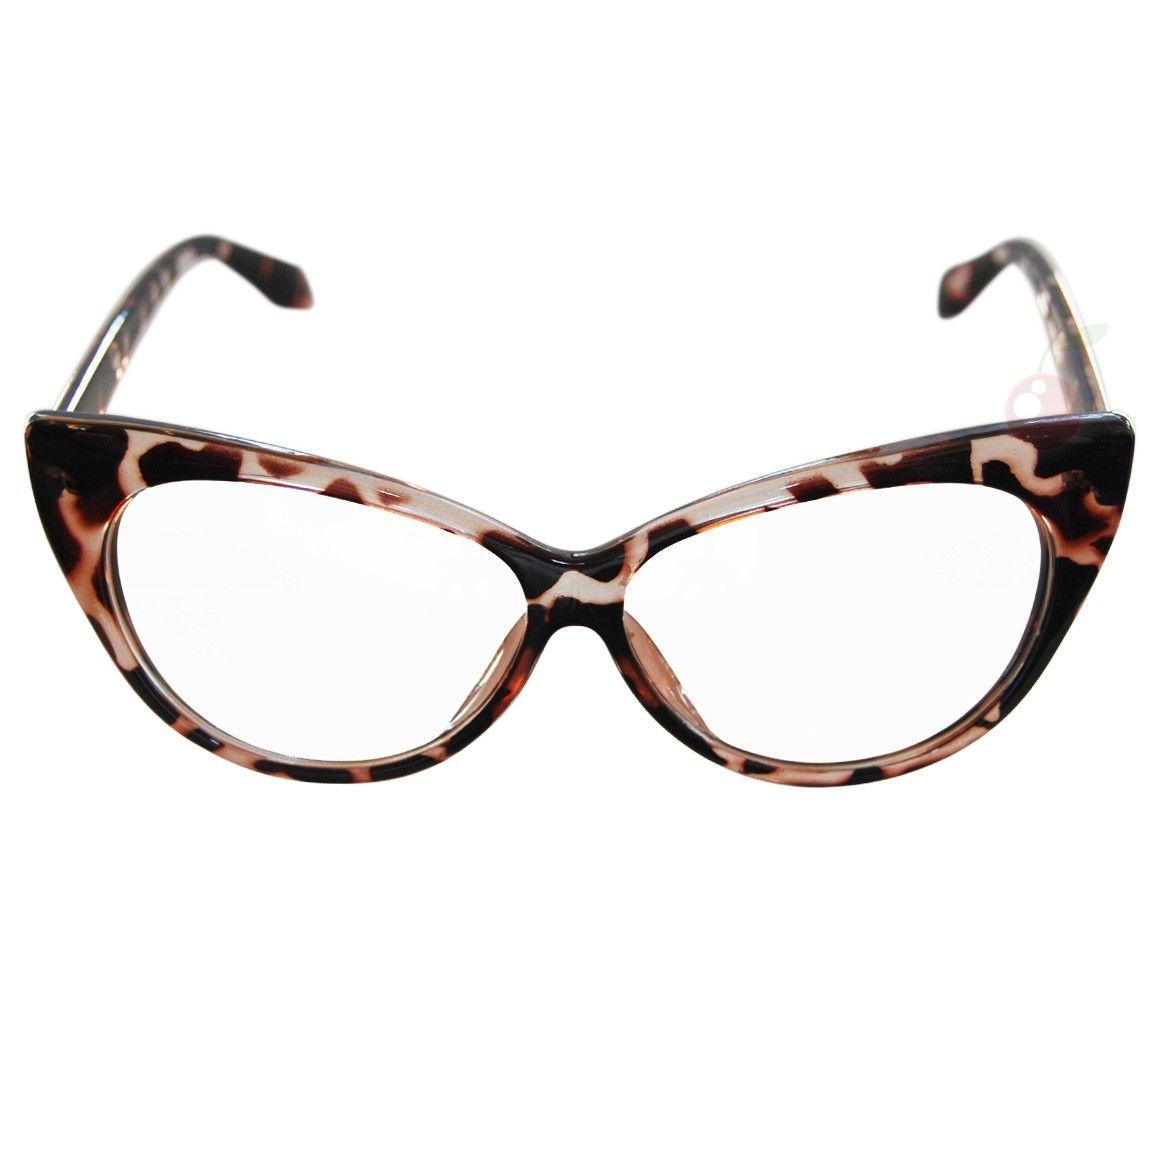 03385d9a29c Cat Eye Costume Glasses - Tortoiseshell in 2019